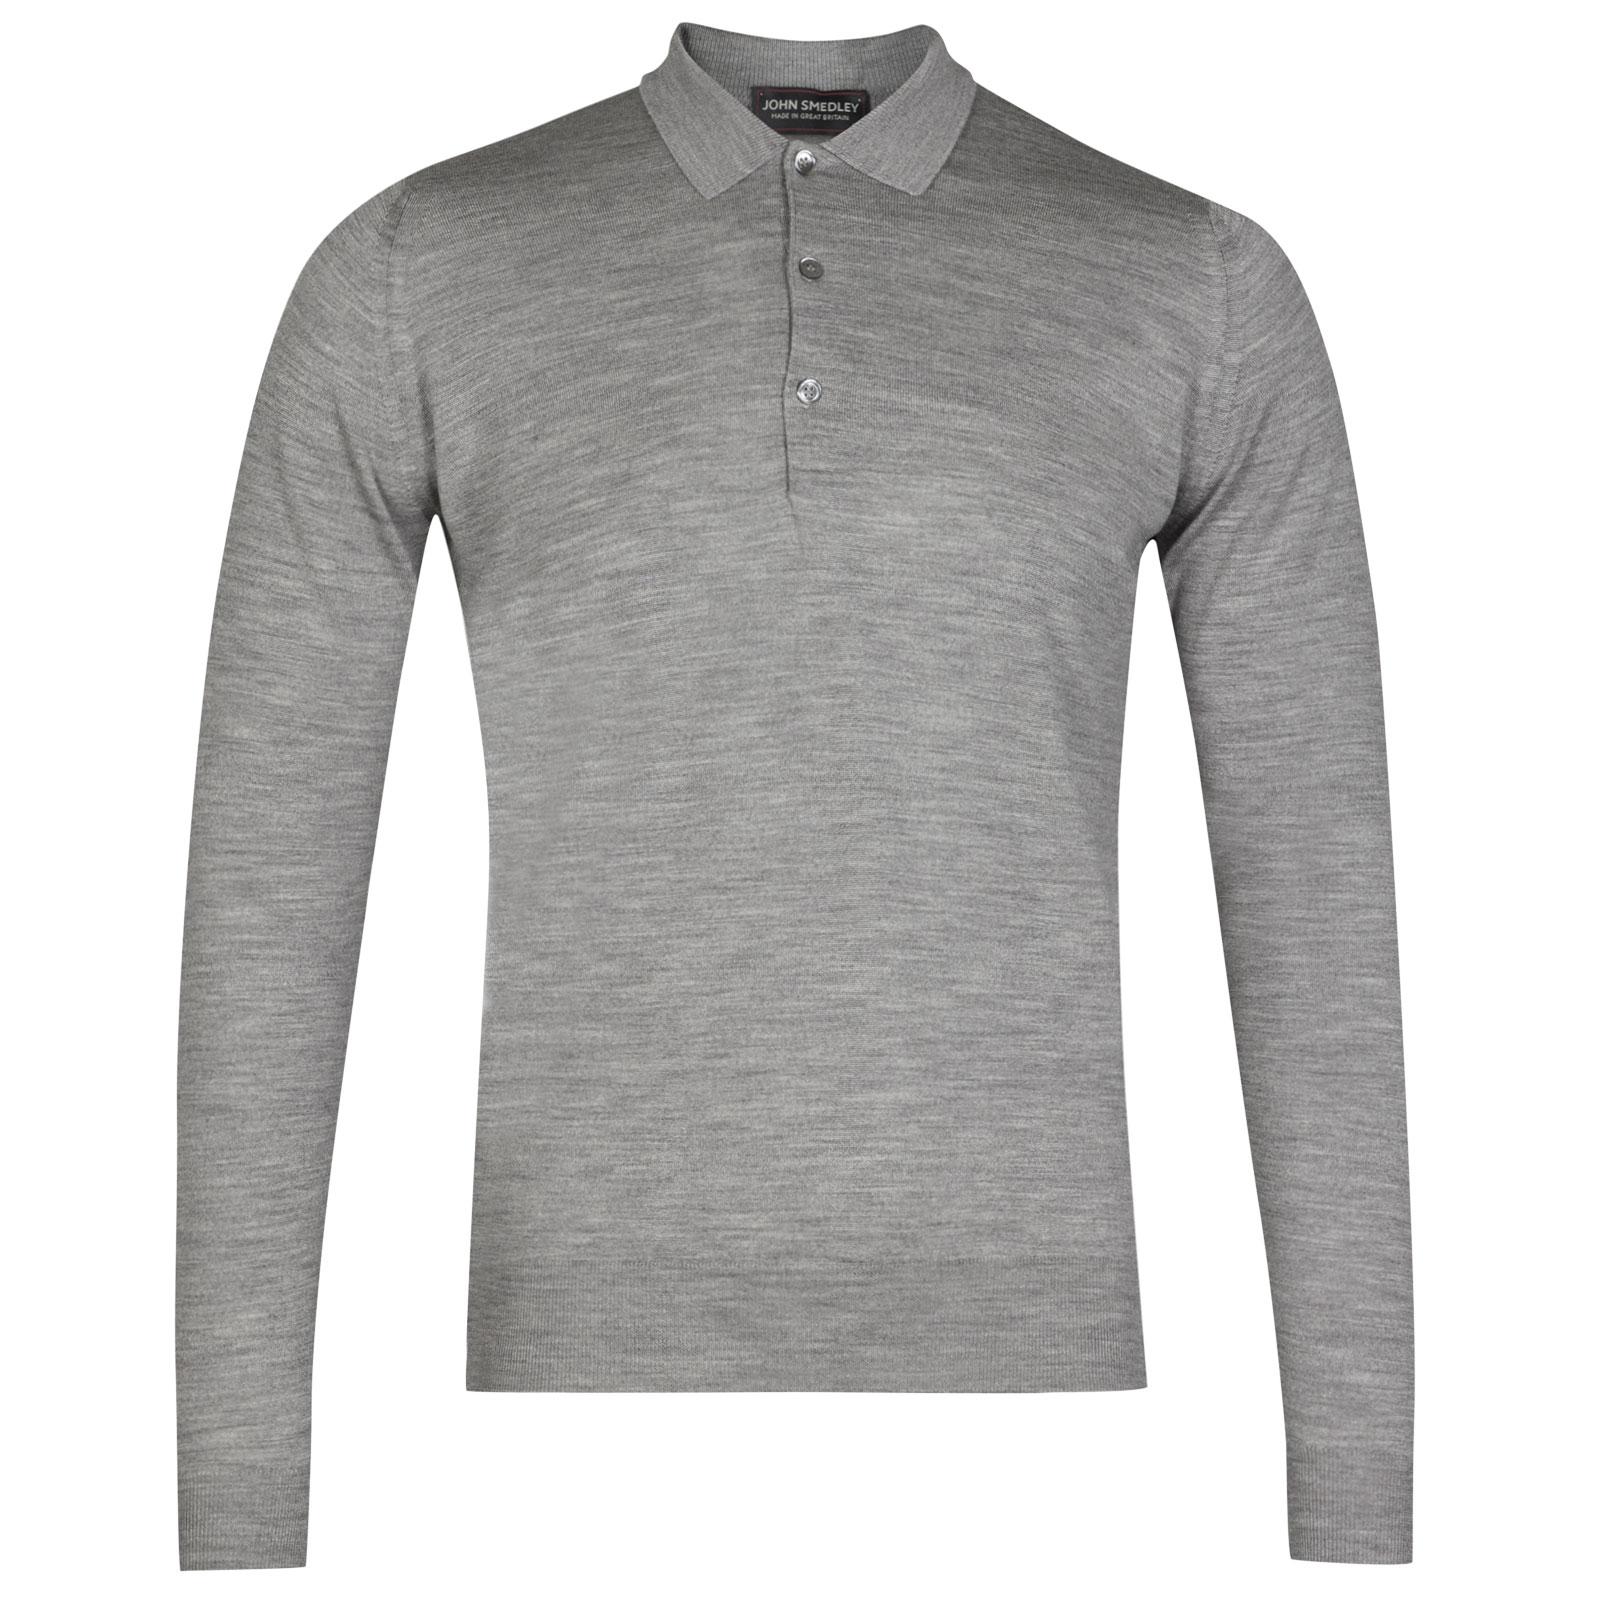 John Smedley belper Merino Wool Shirt in Silver-XL